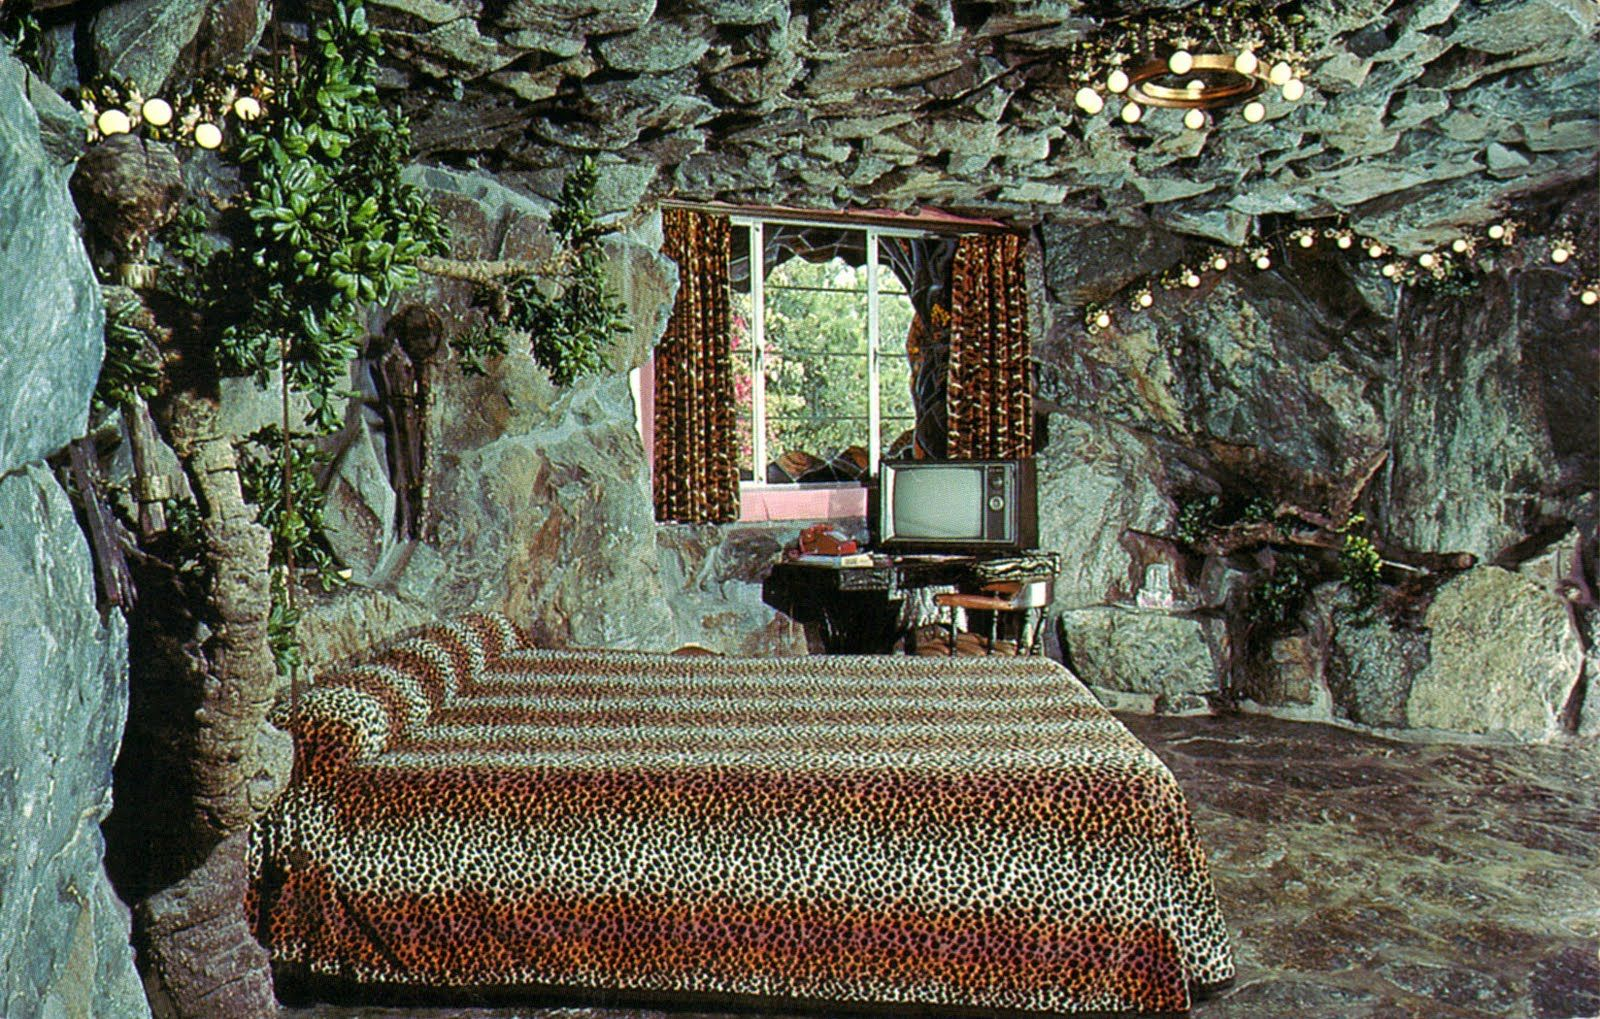 Cave Man Room 137 At The Madonna Inn San Luis Obispo California